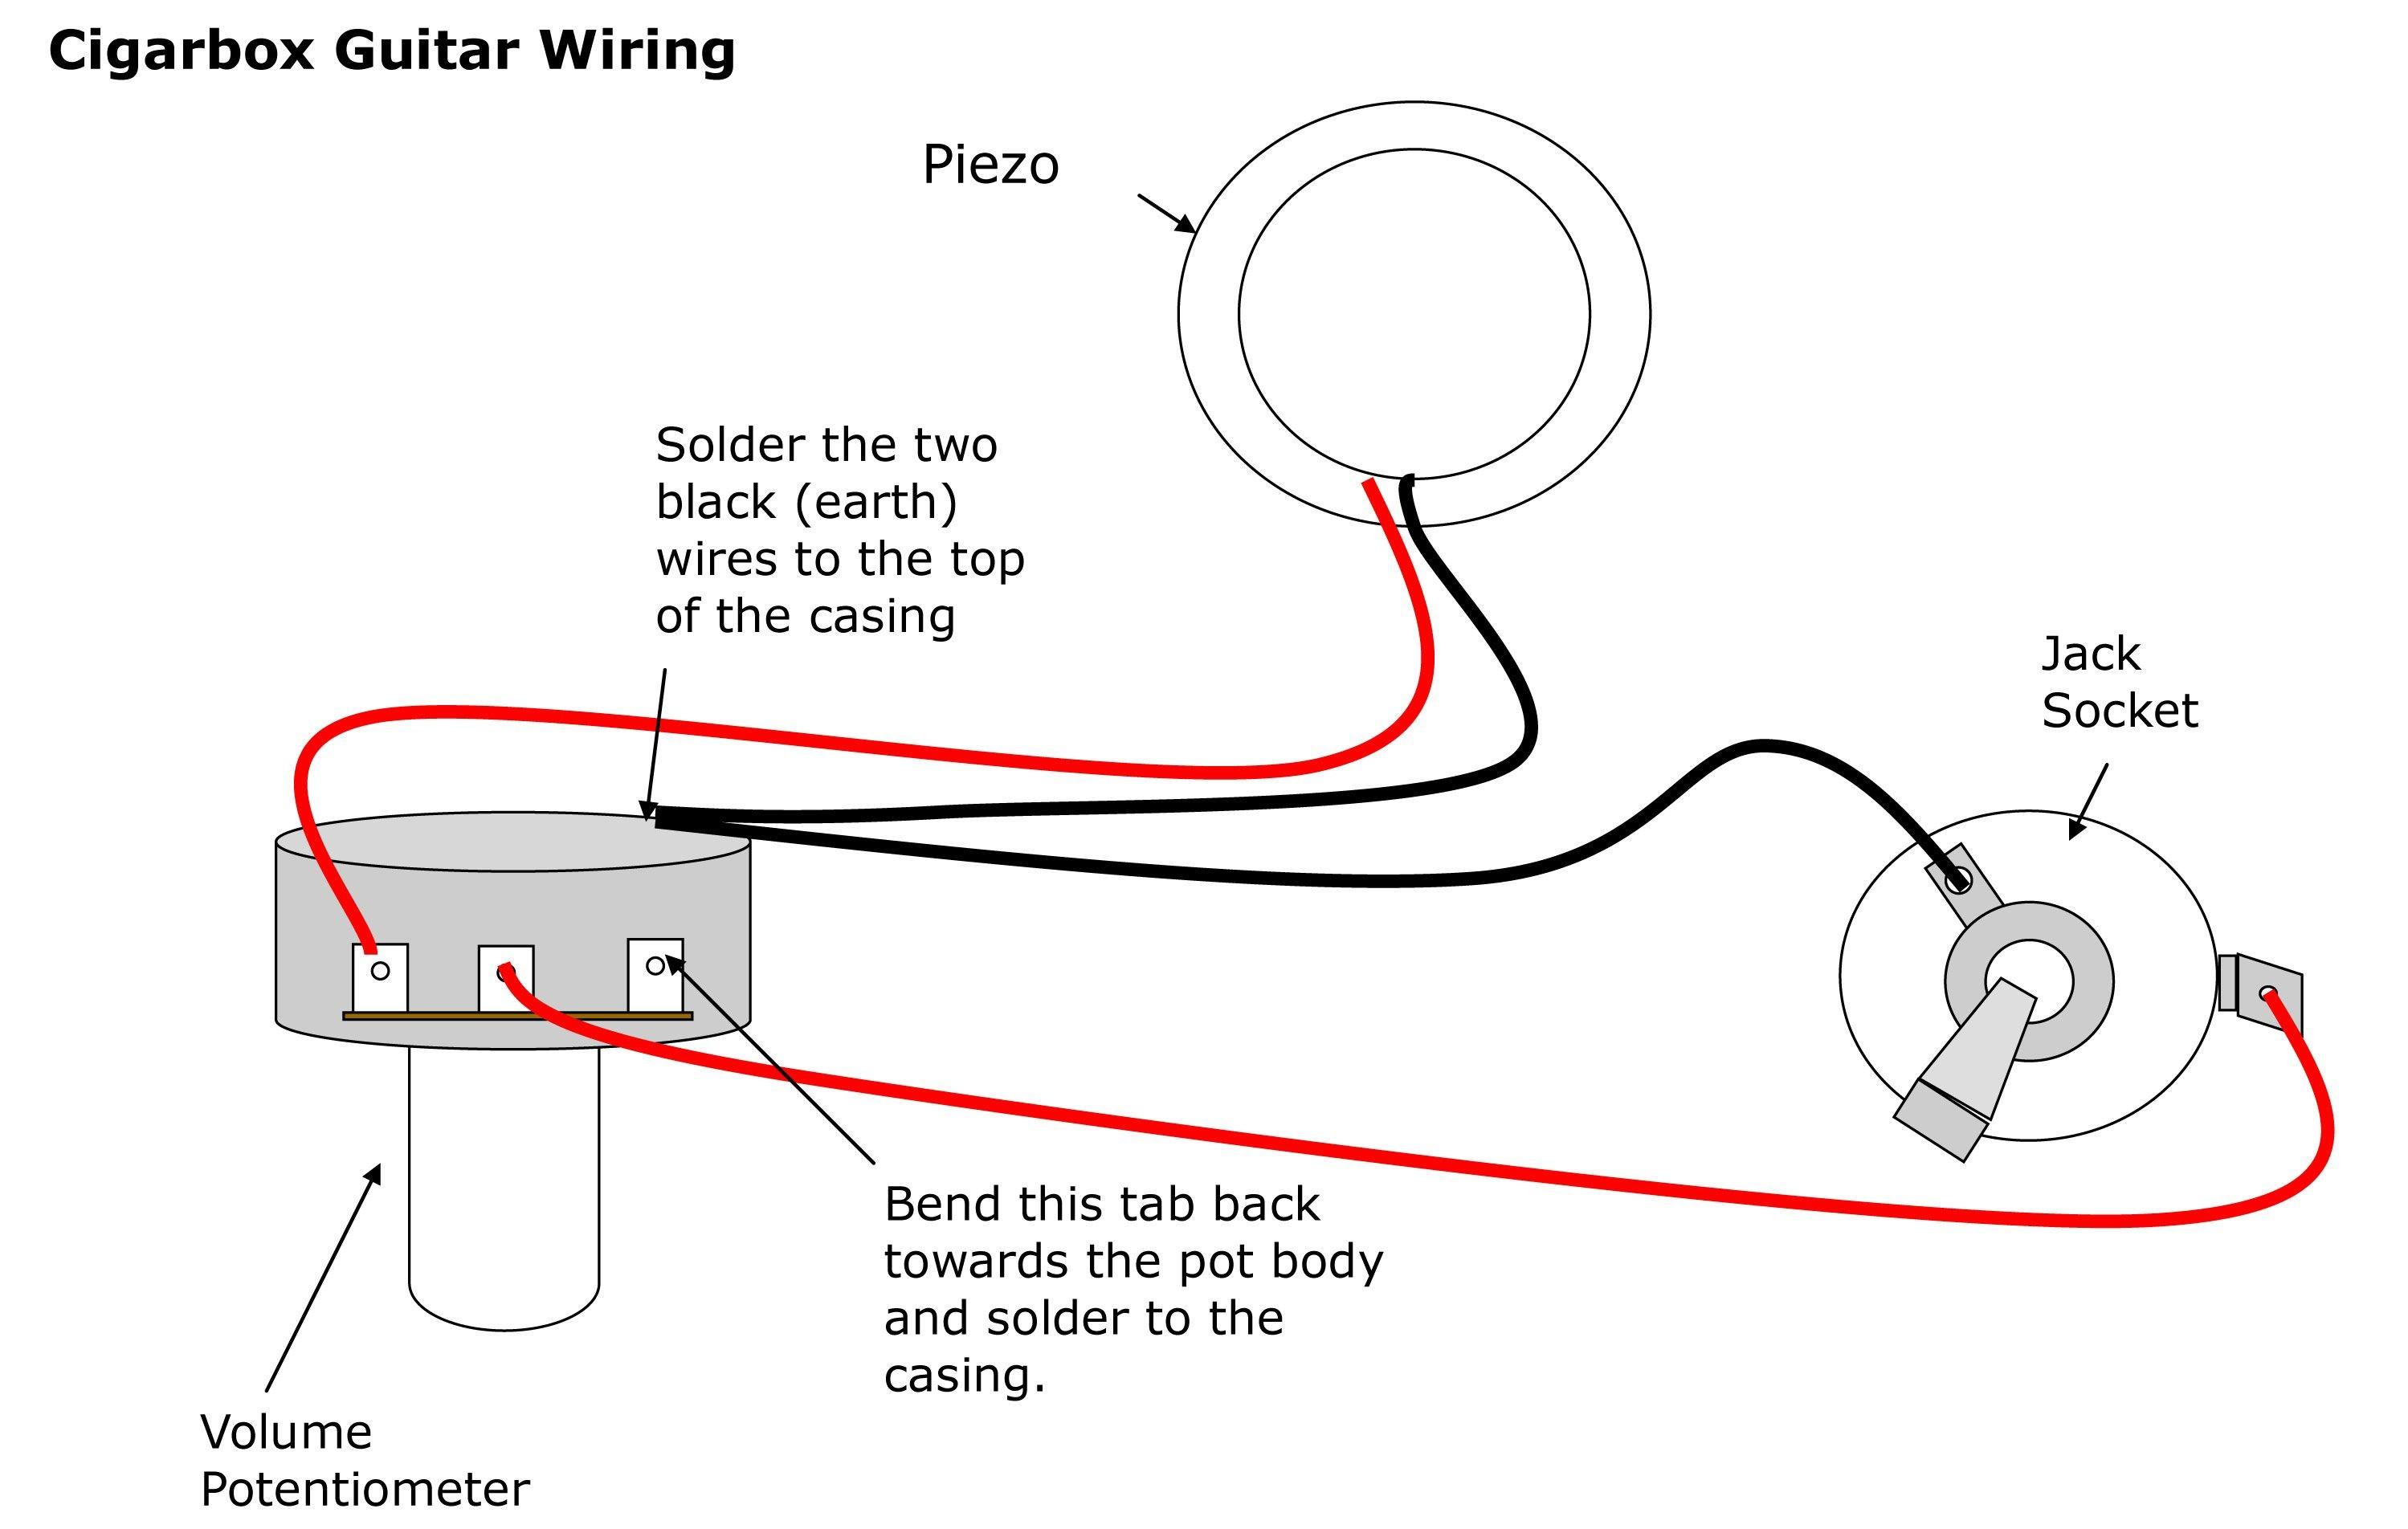 Wiring single piezo with volume control